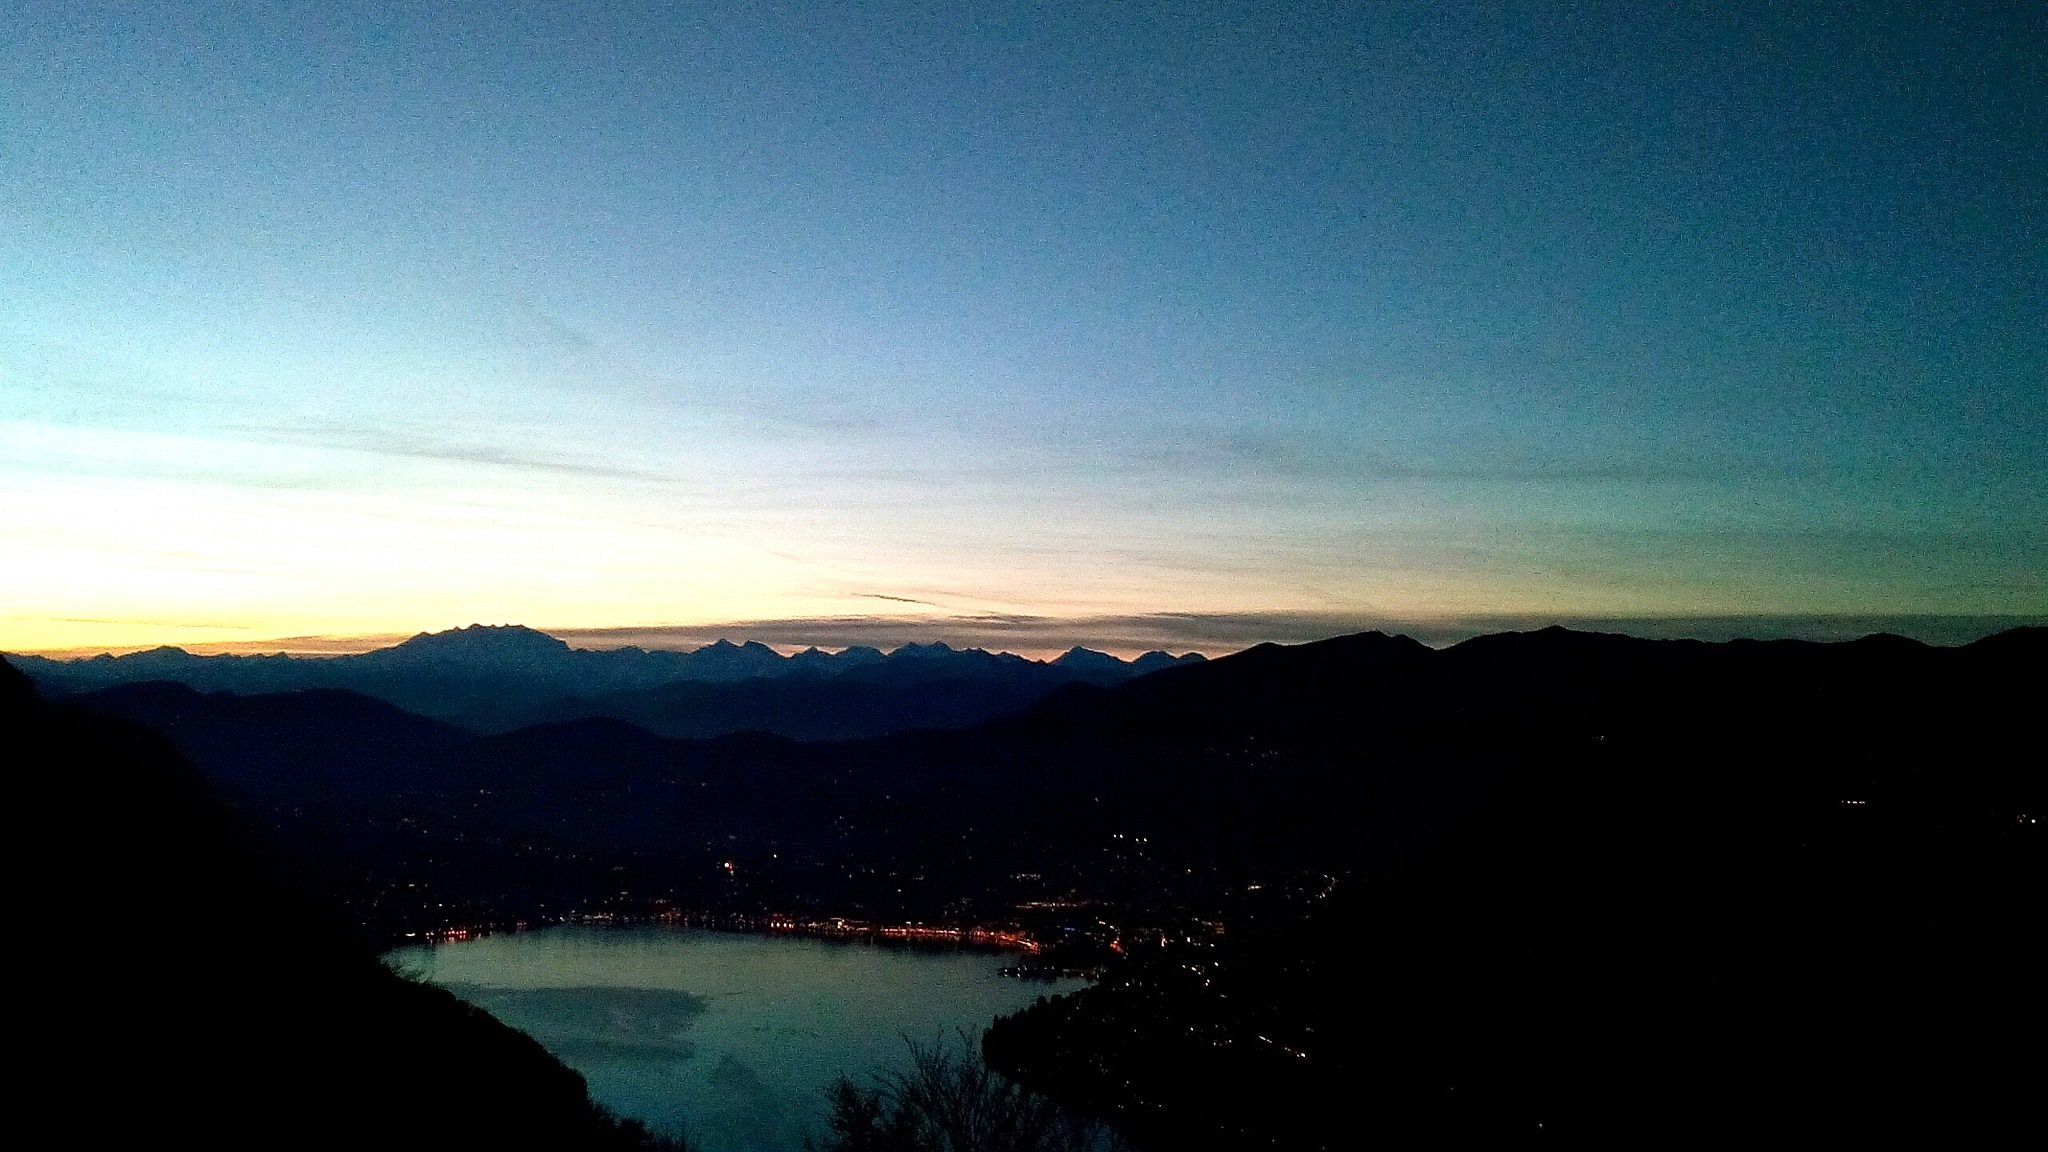 Lugano Lake by Paolo Pasquali